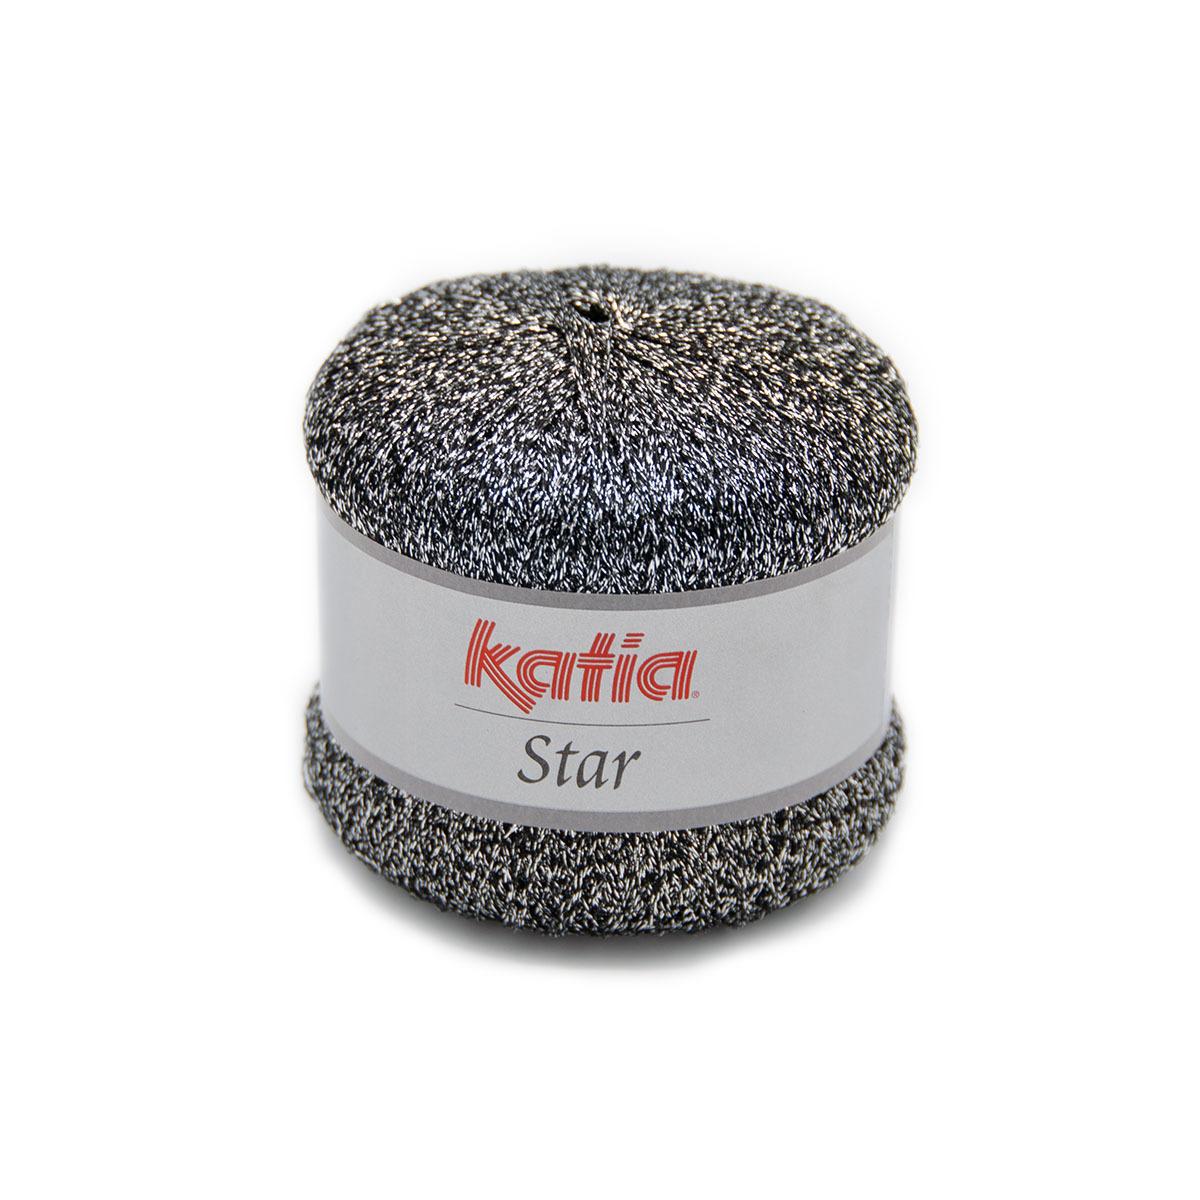 Katia Star - 500